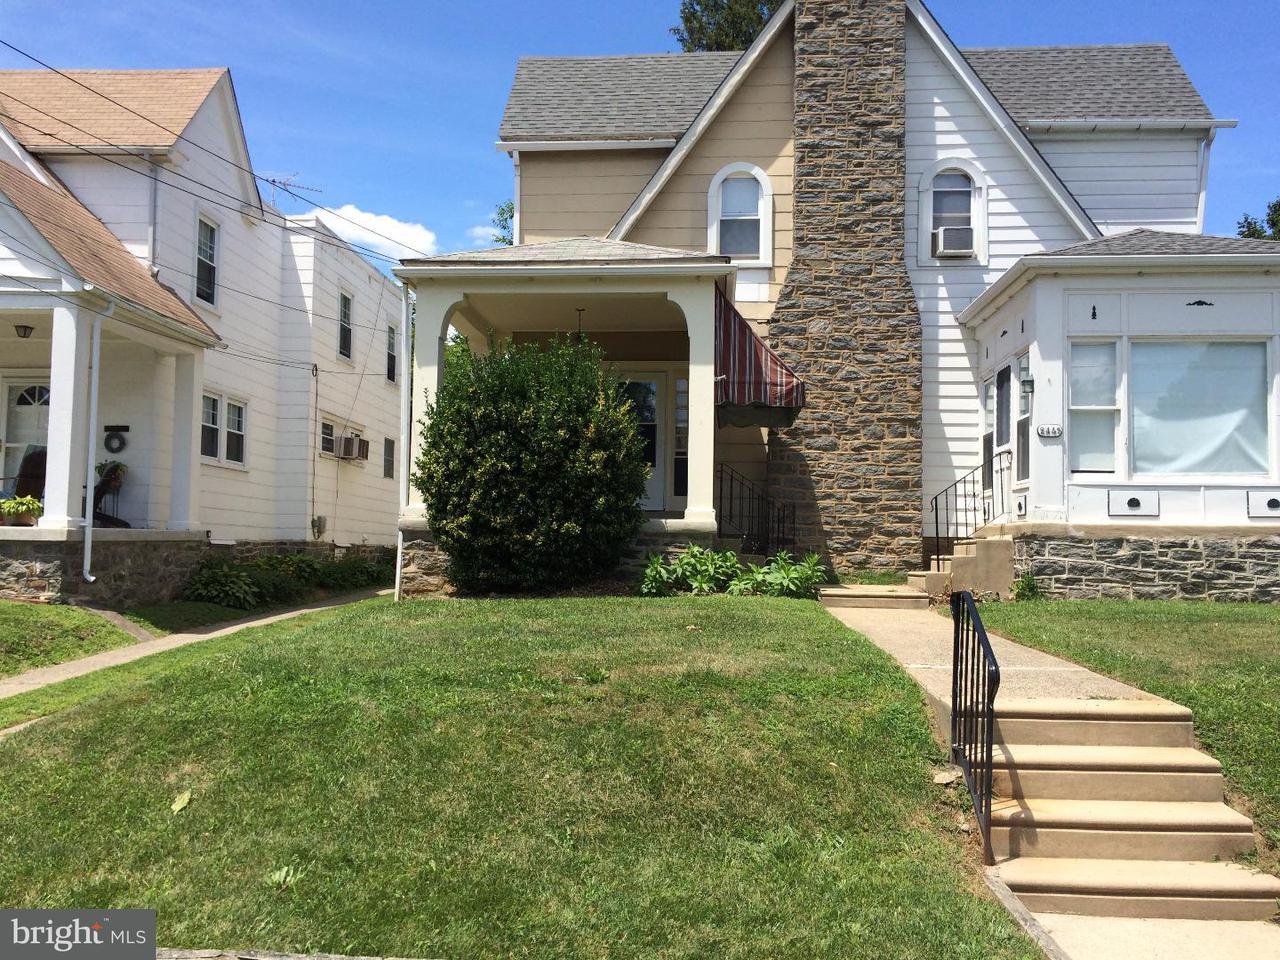 Townhouse for Rent at 2447 ELDON Avenue Drexel Hill, Pennsylvania 19026 United States